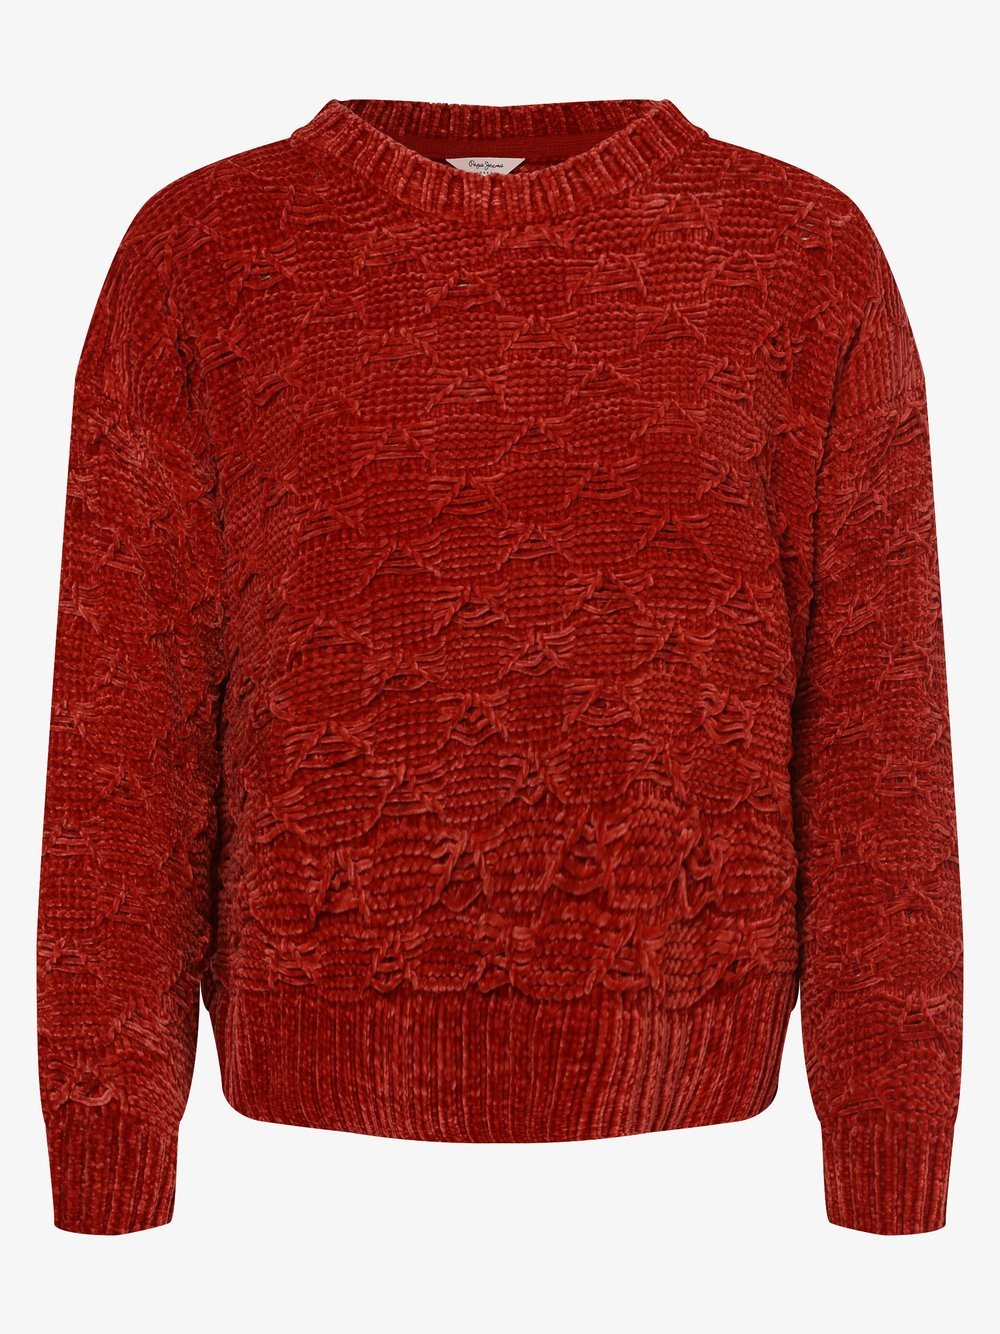 Pepe Jeans - Sweter damski – Lala, czerwony